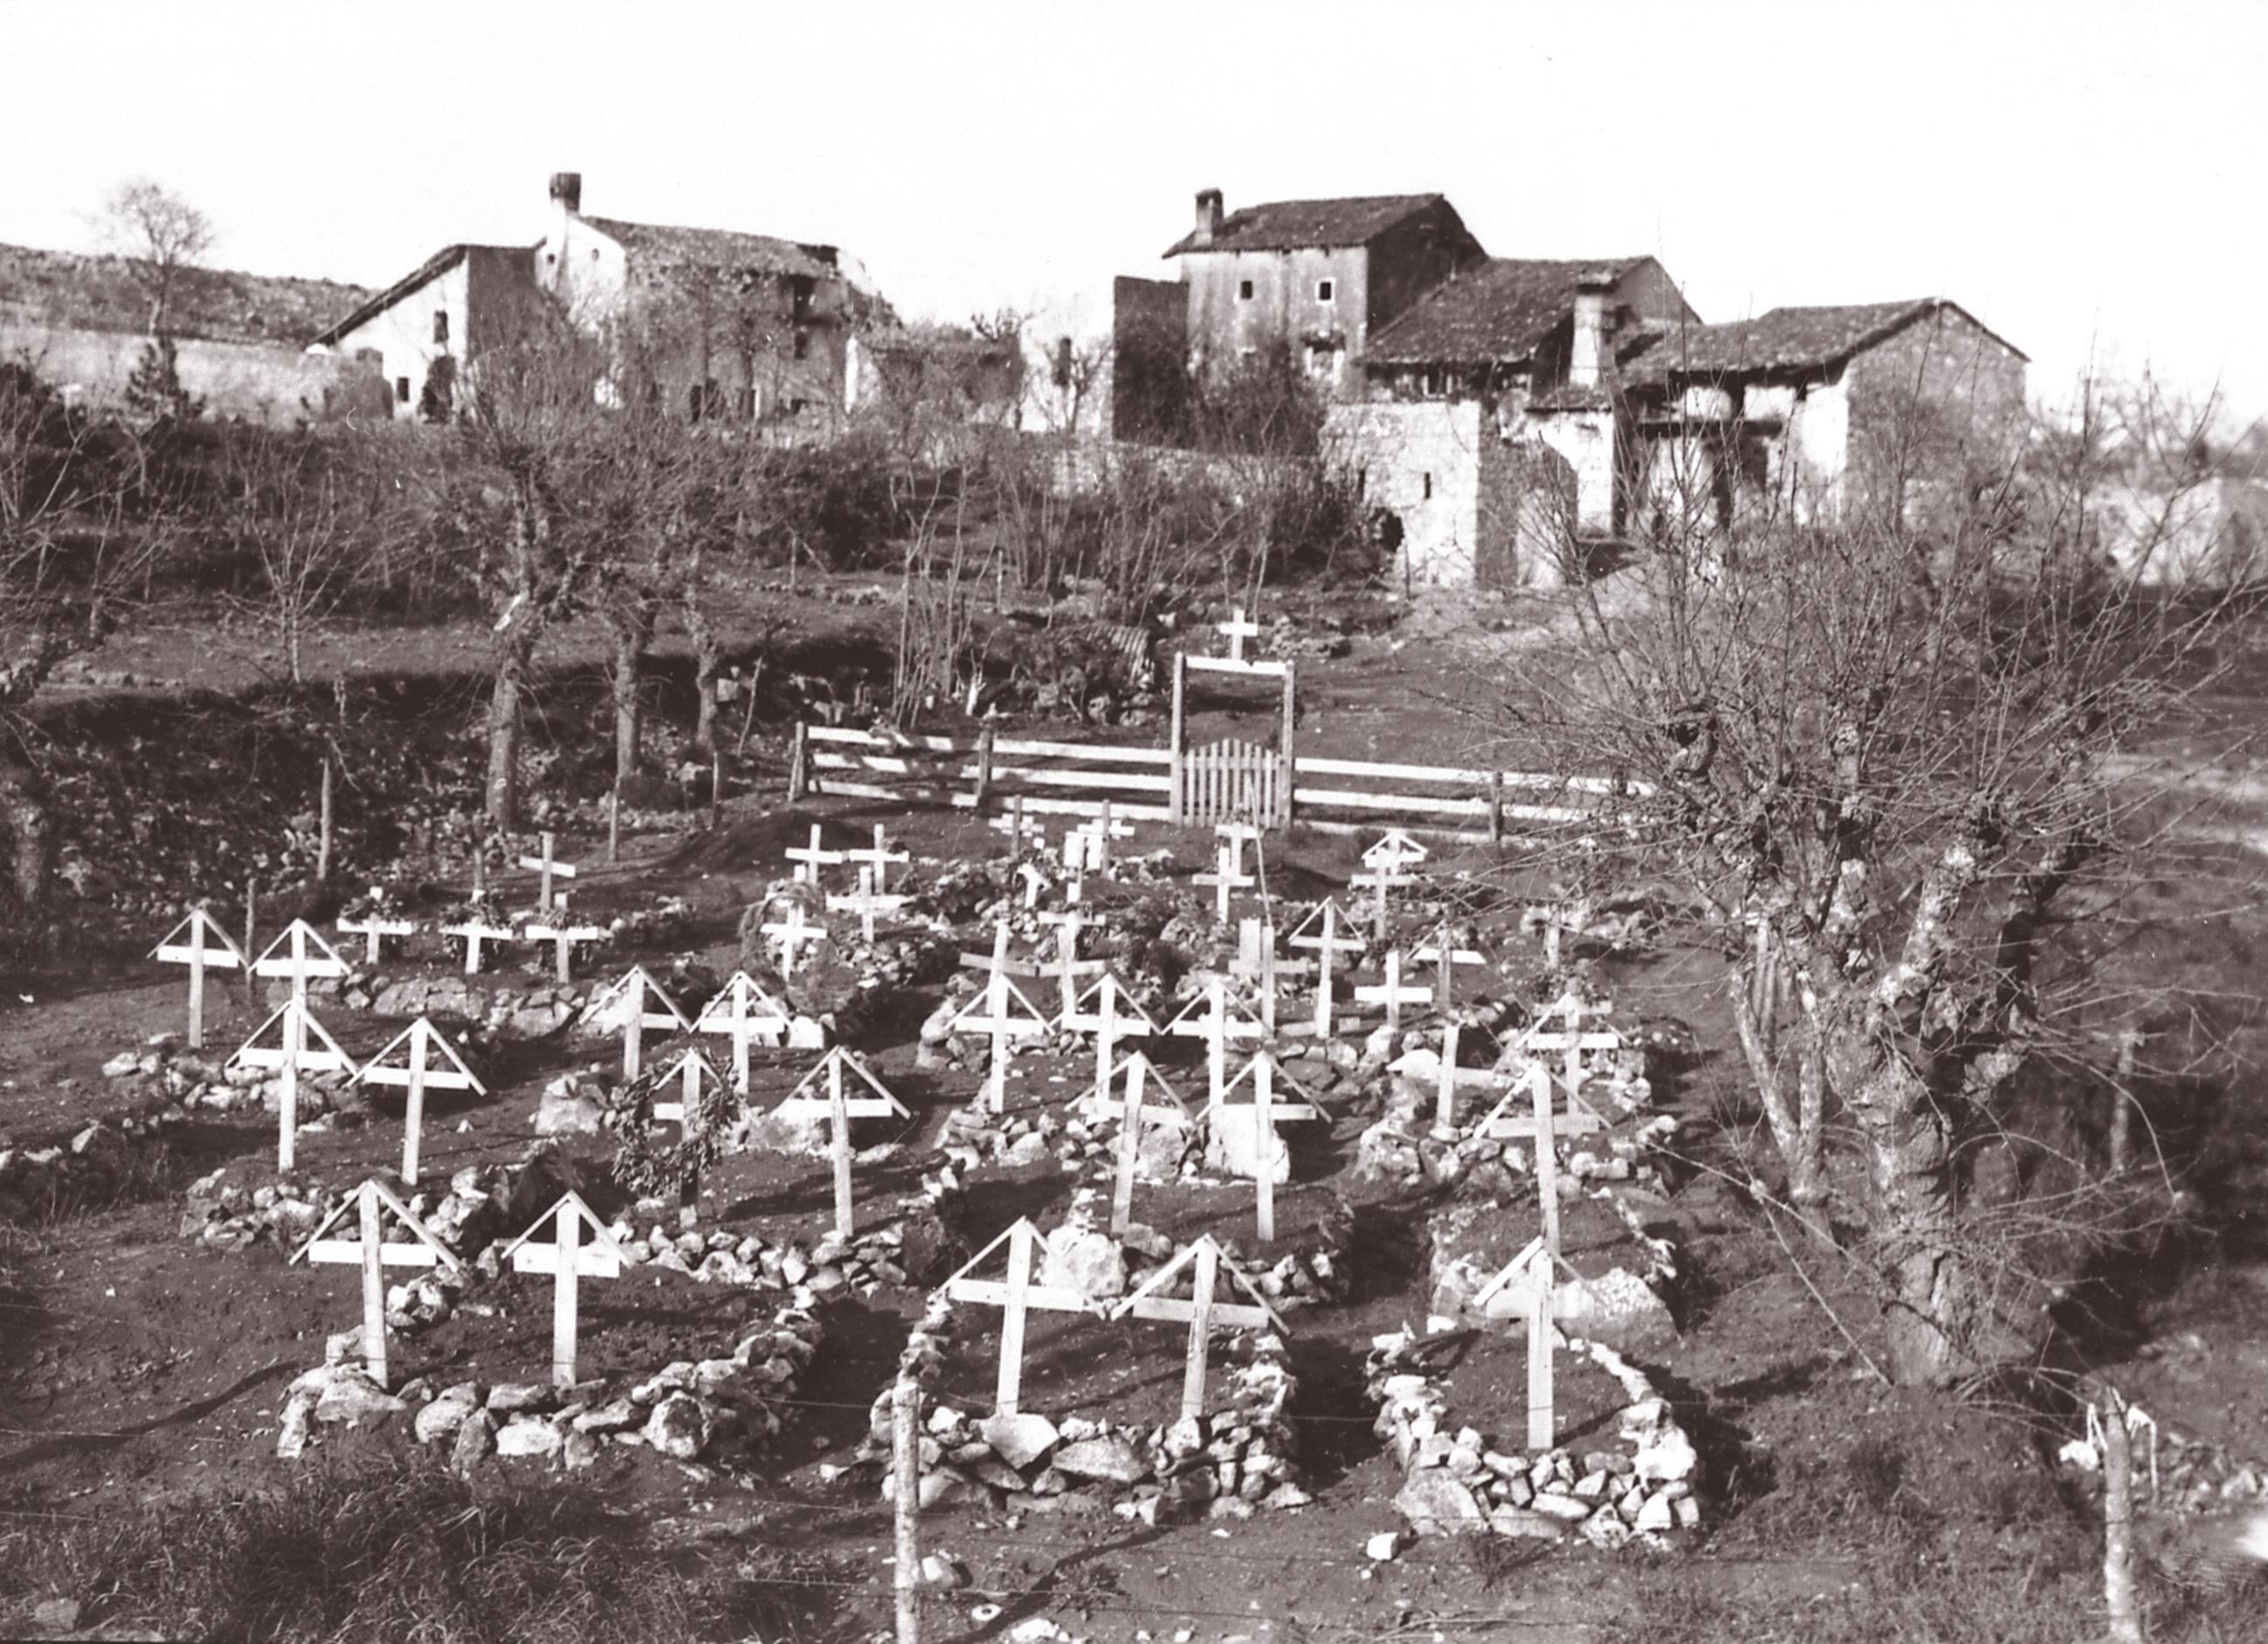 Fotografia del 1915 del cimitero